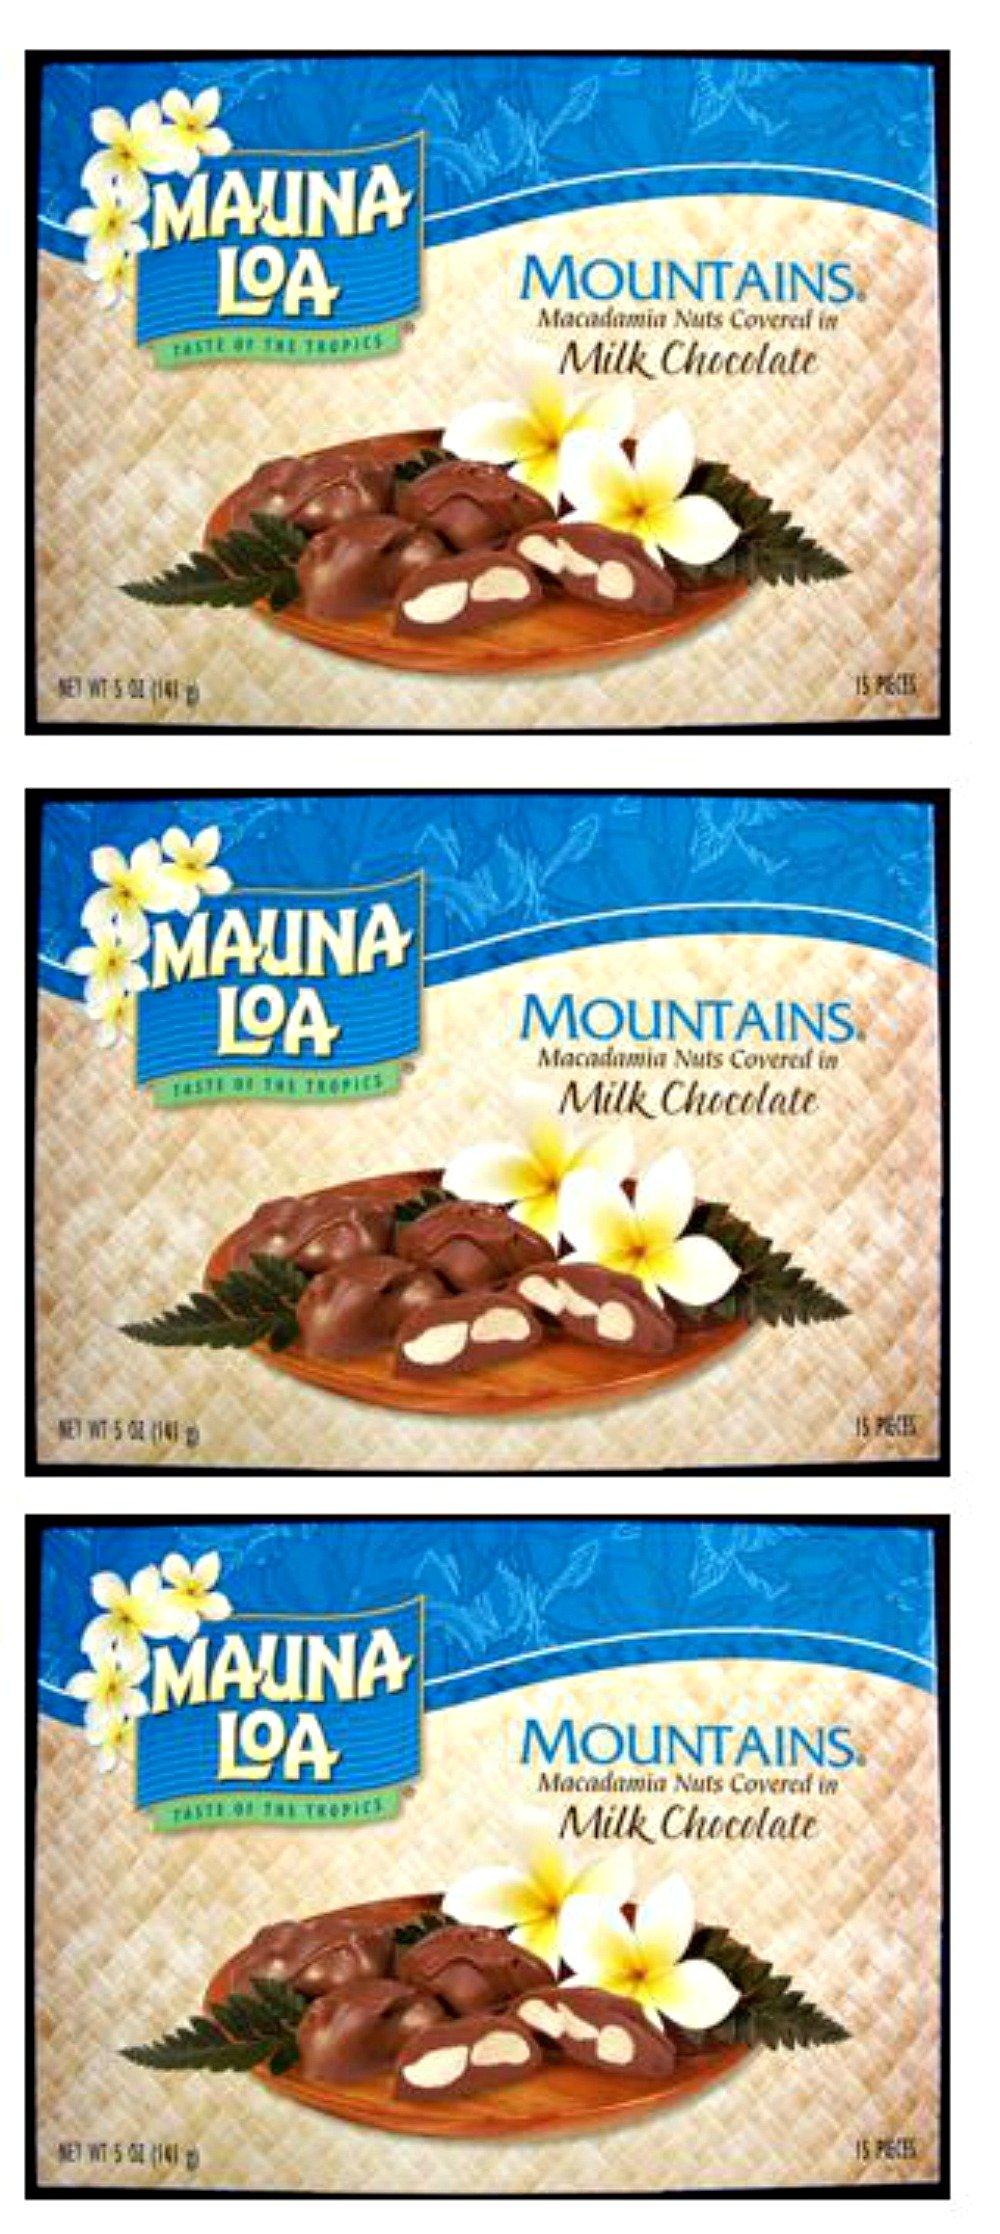 Multi Pack Mauna Loa Mountains Chocolate Covered Macadamia Nuts (3-5oz boxes) (3 Boxes-45 pieces) by Mauna Loa